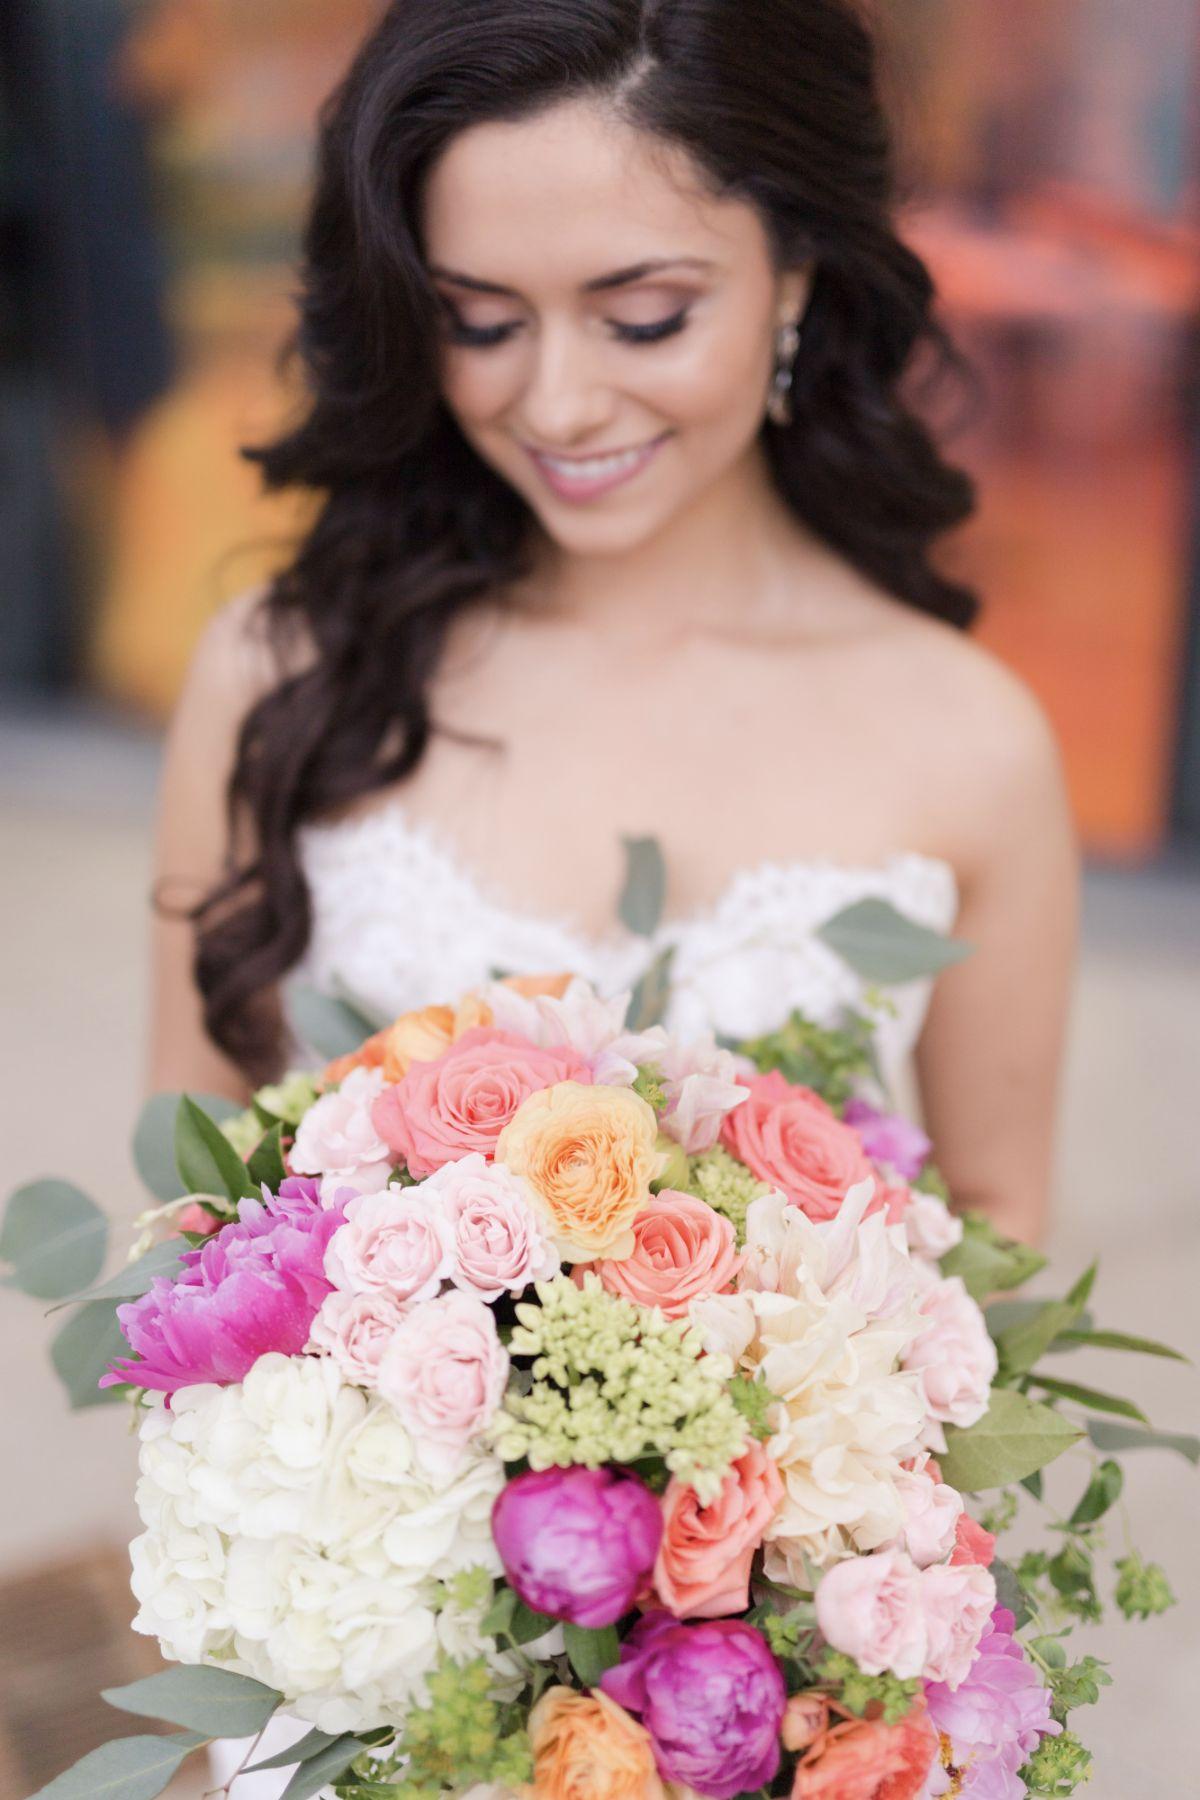 Posh and Prim - Kansas City and Detroit Wedding Planner - Photo - Personal - 42.jpg